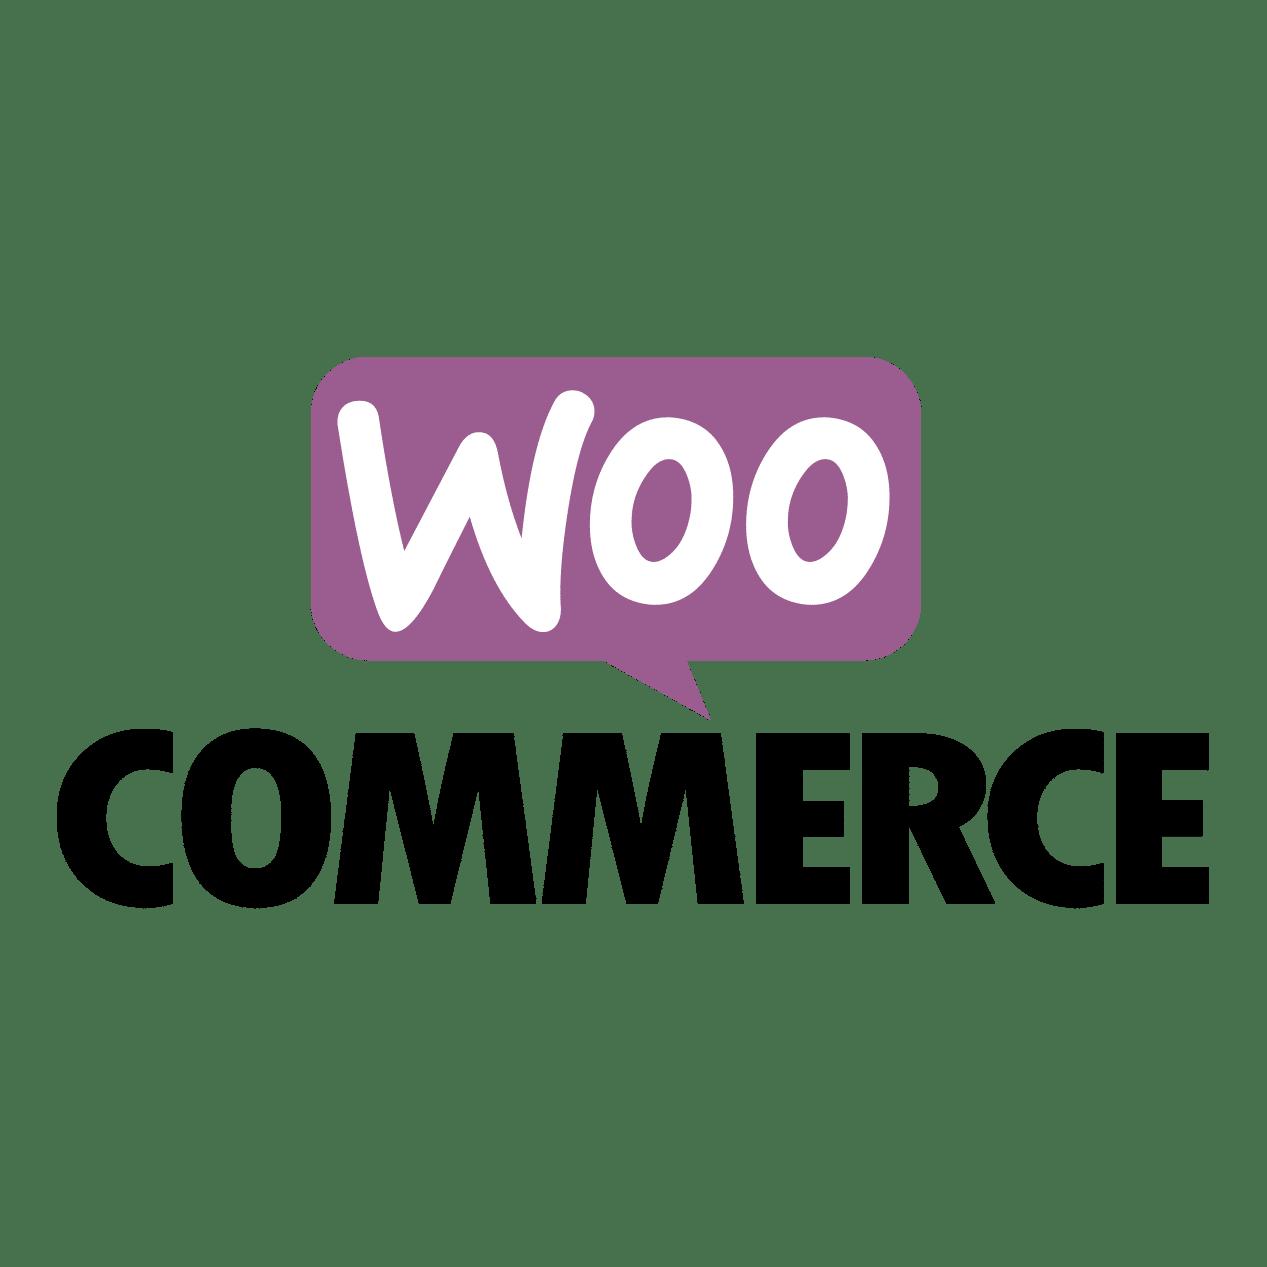 sviluppo-ecommerce-con-woocommerce/